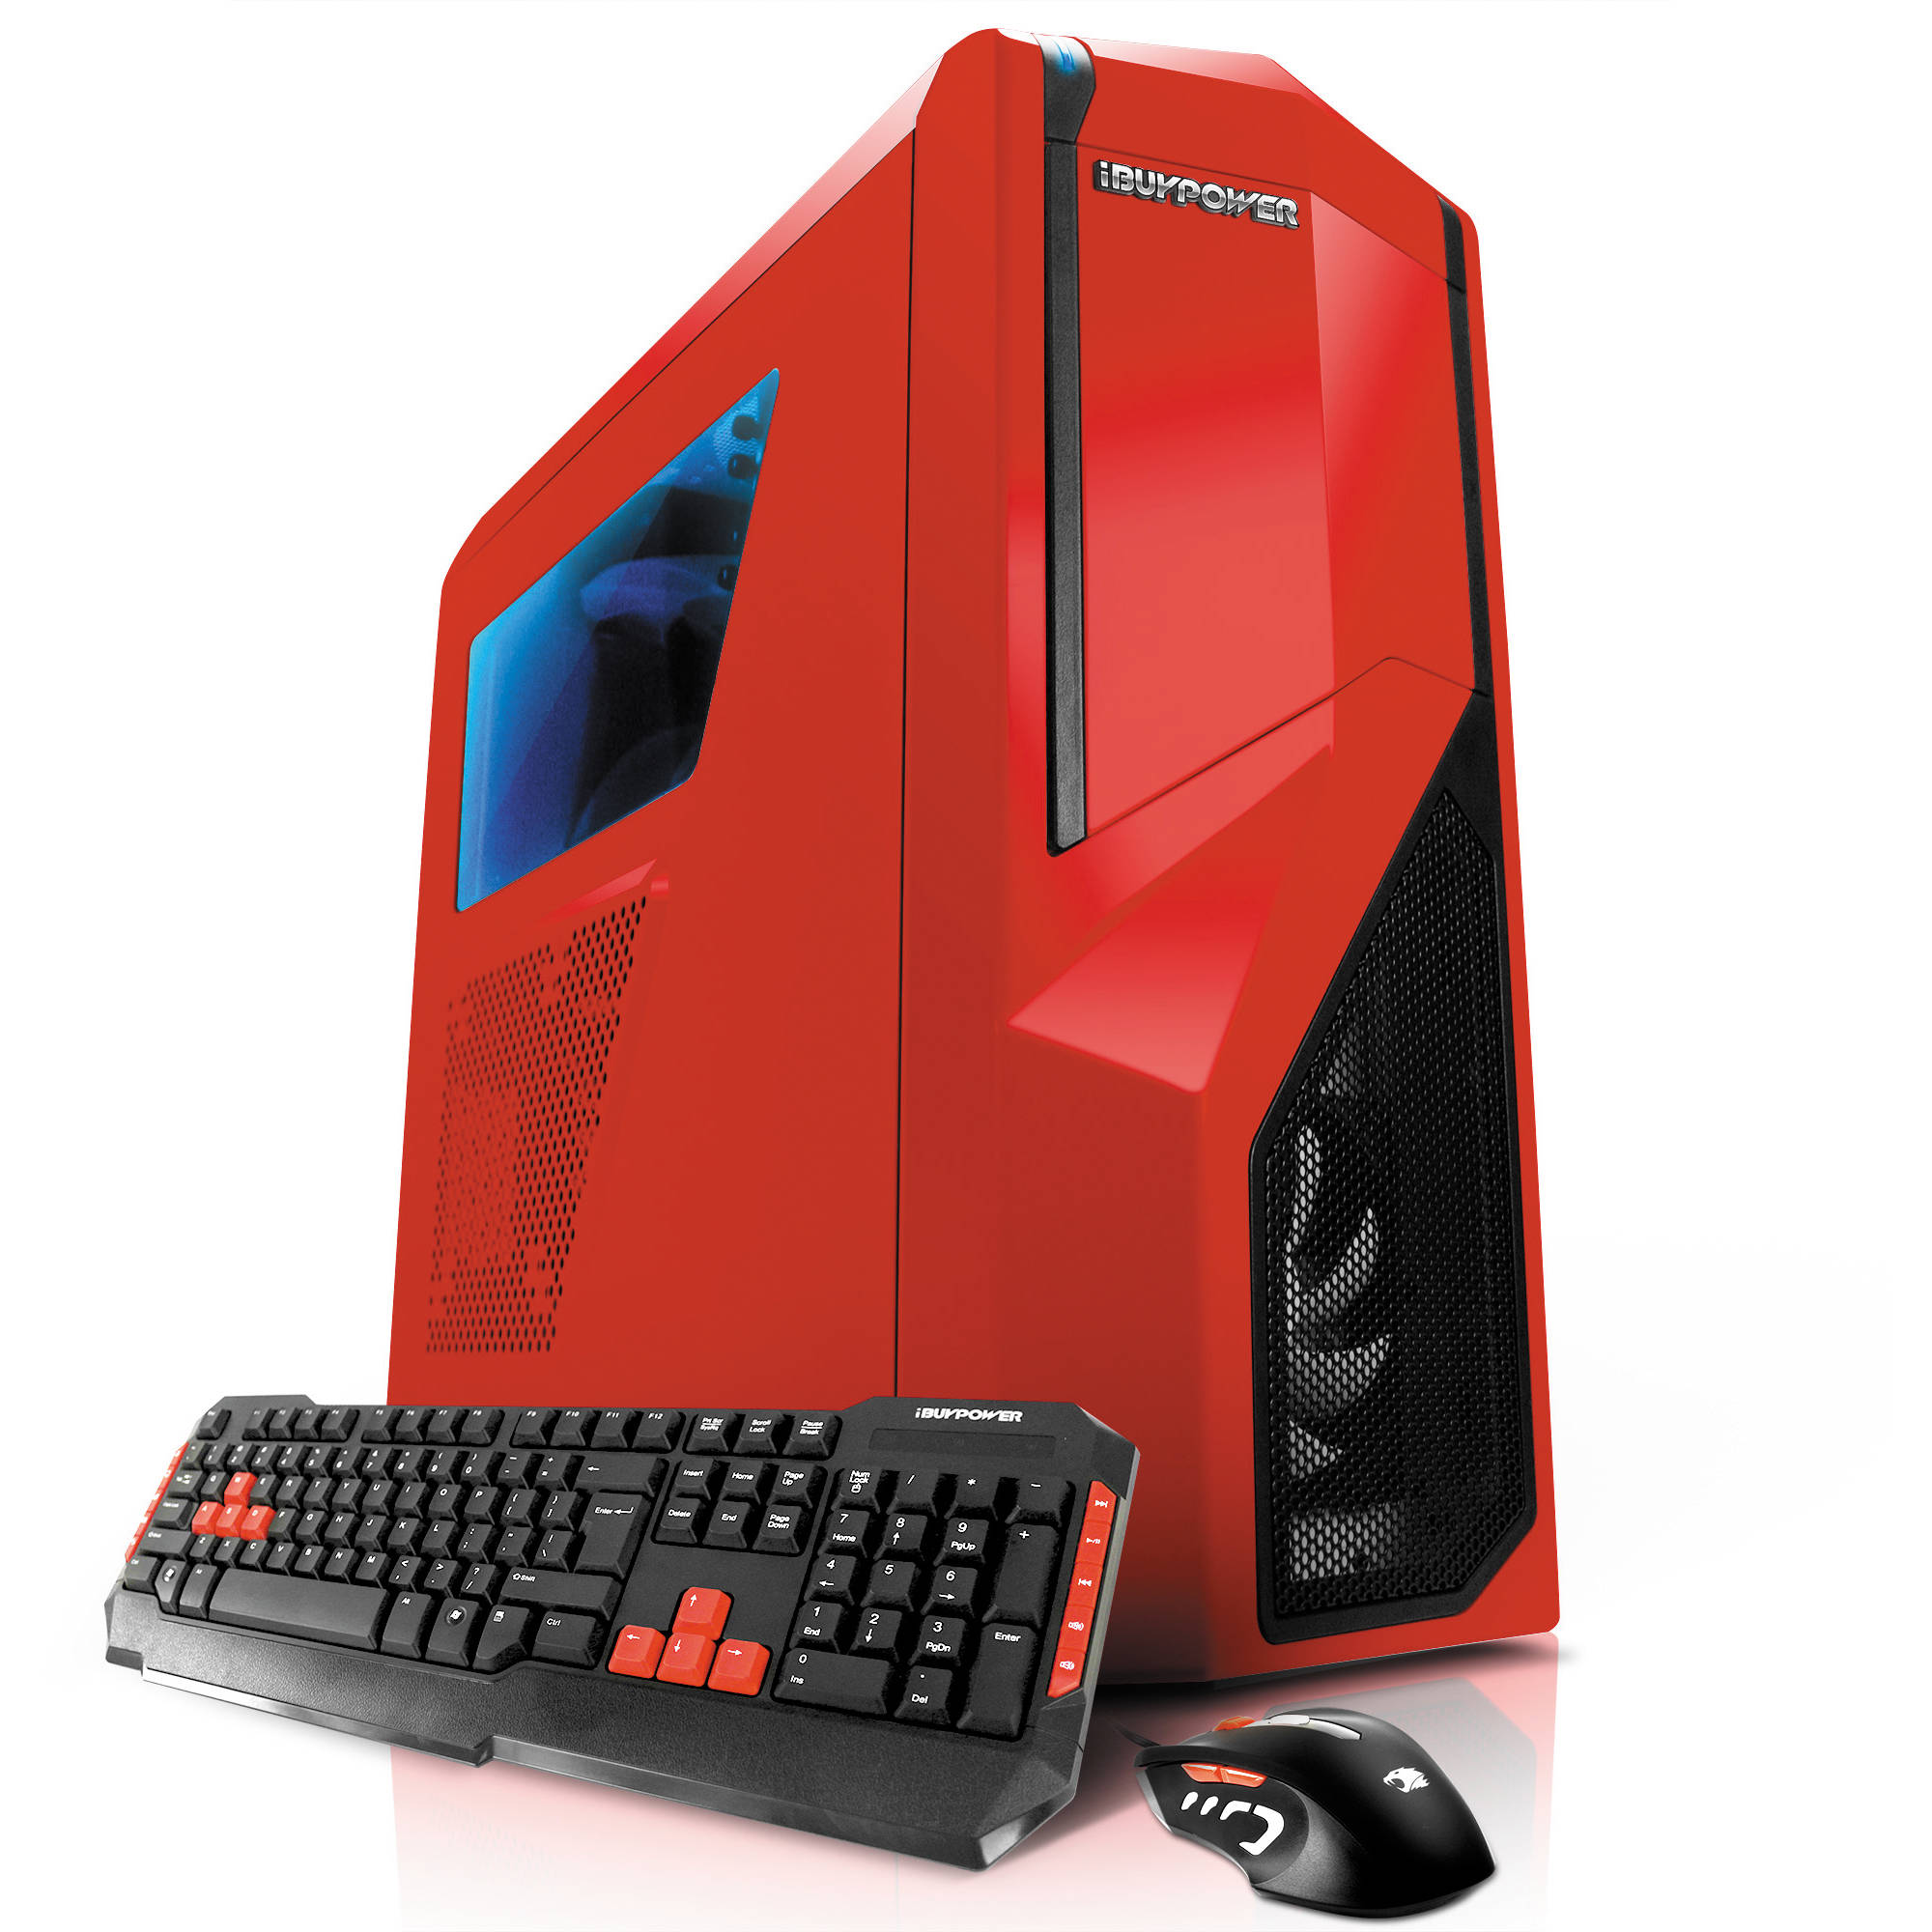 Superb Ibuypower Na014 Desktop Computer Red Download Free Architecture Designs Barepgrimeyleaguecom